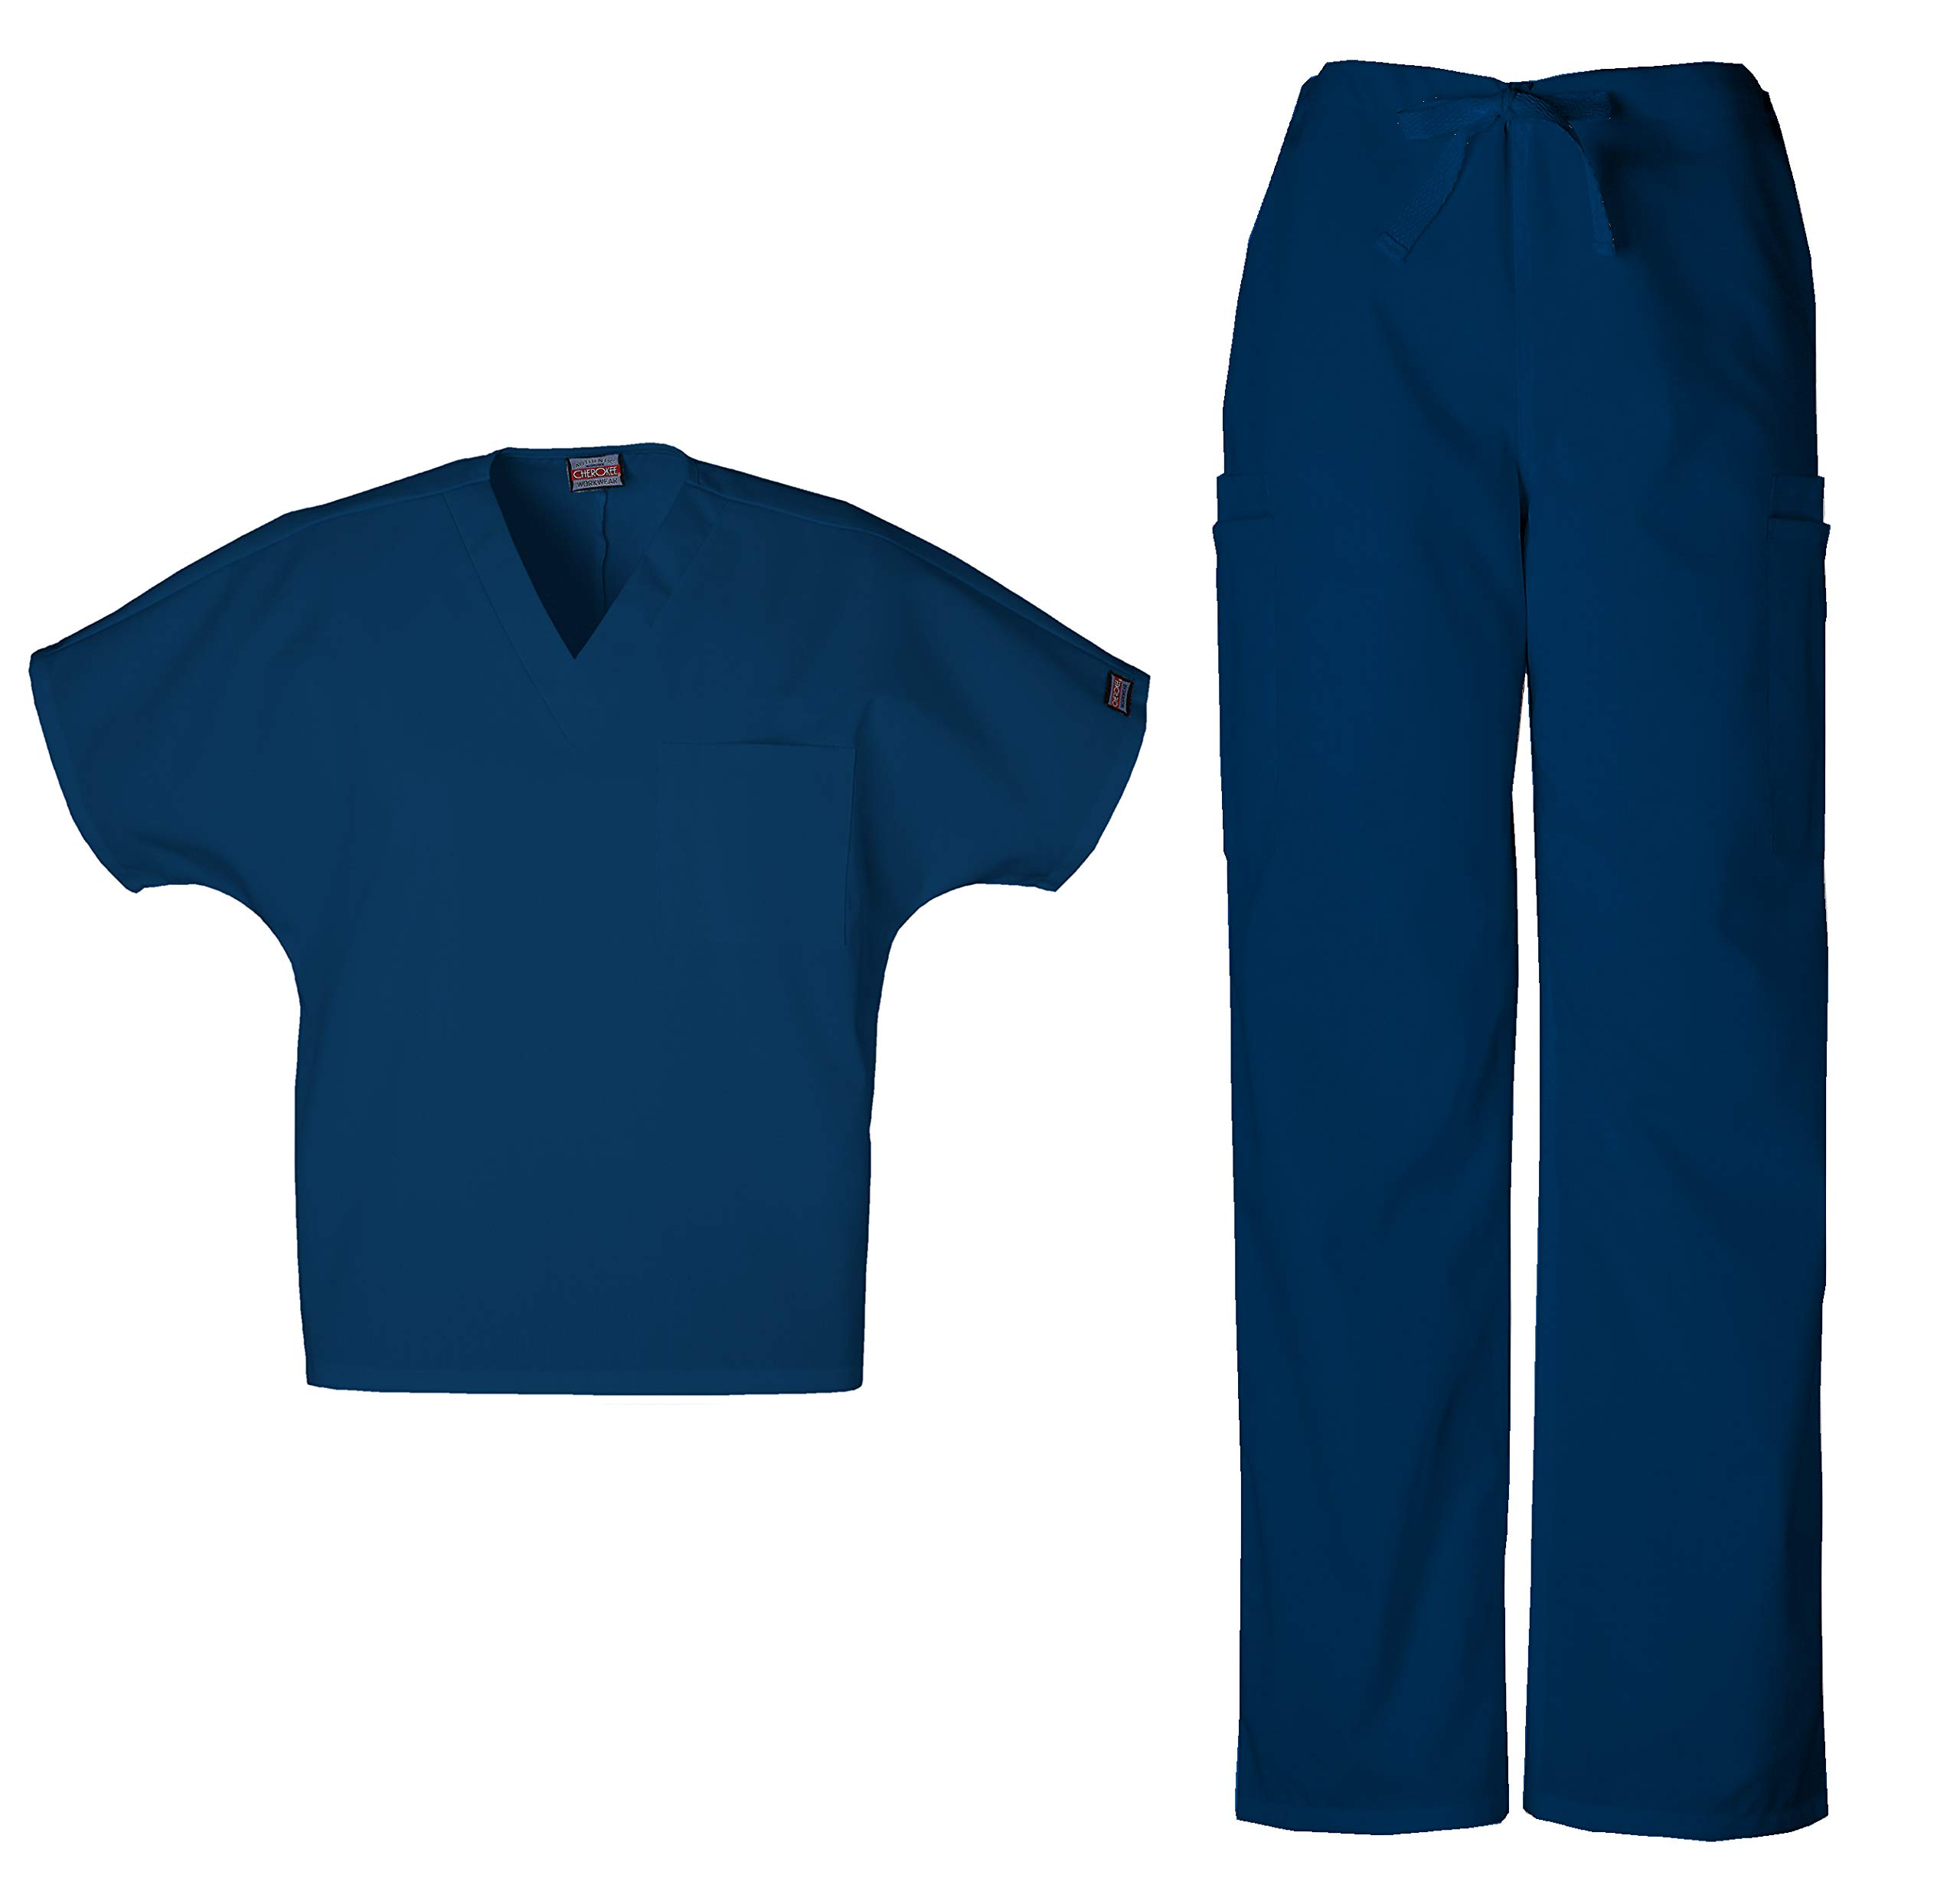 Cherokee Workwear Men's Dental/Medical Uniform Scrub Set - 4777 V-Neck Scrub Top & 4000 Drawstring Cargo Pants (Navy - XXX-Large/XXX-Large) by Cherokee